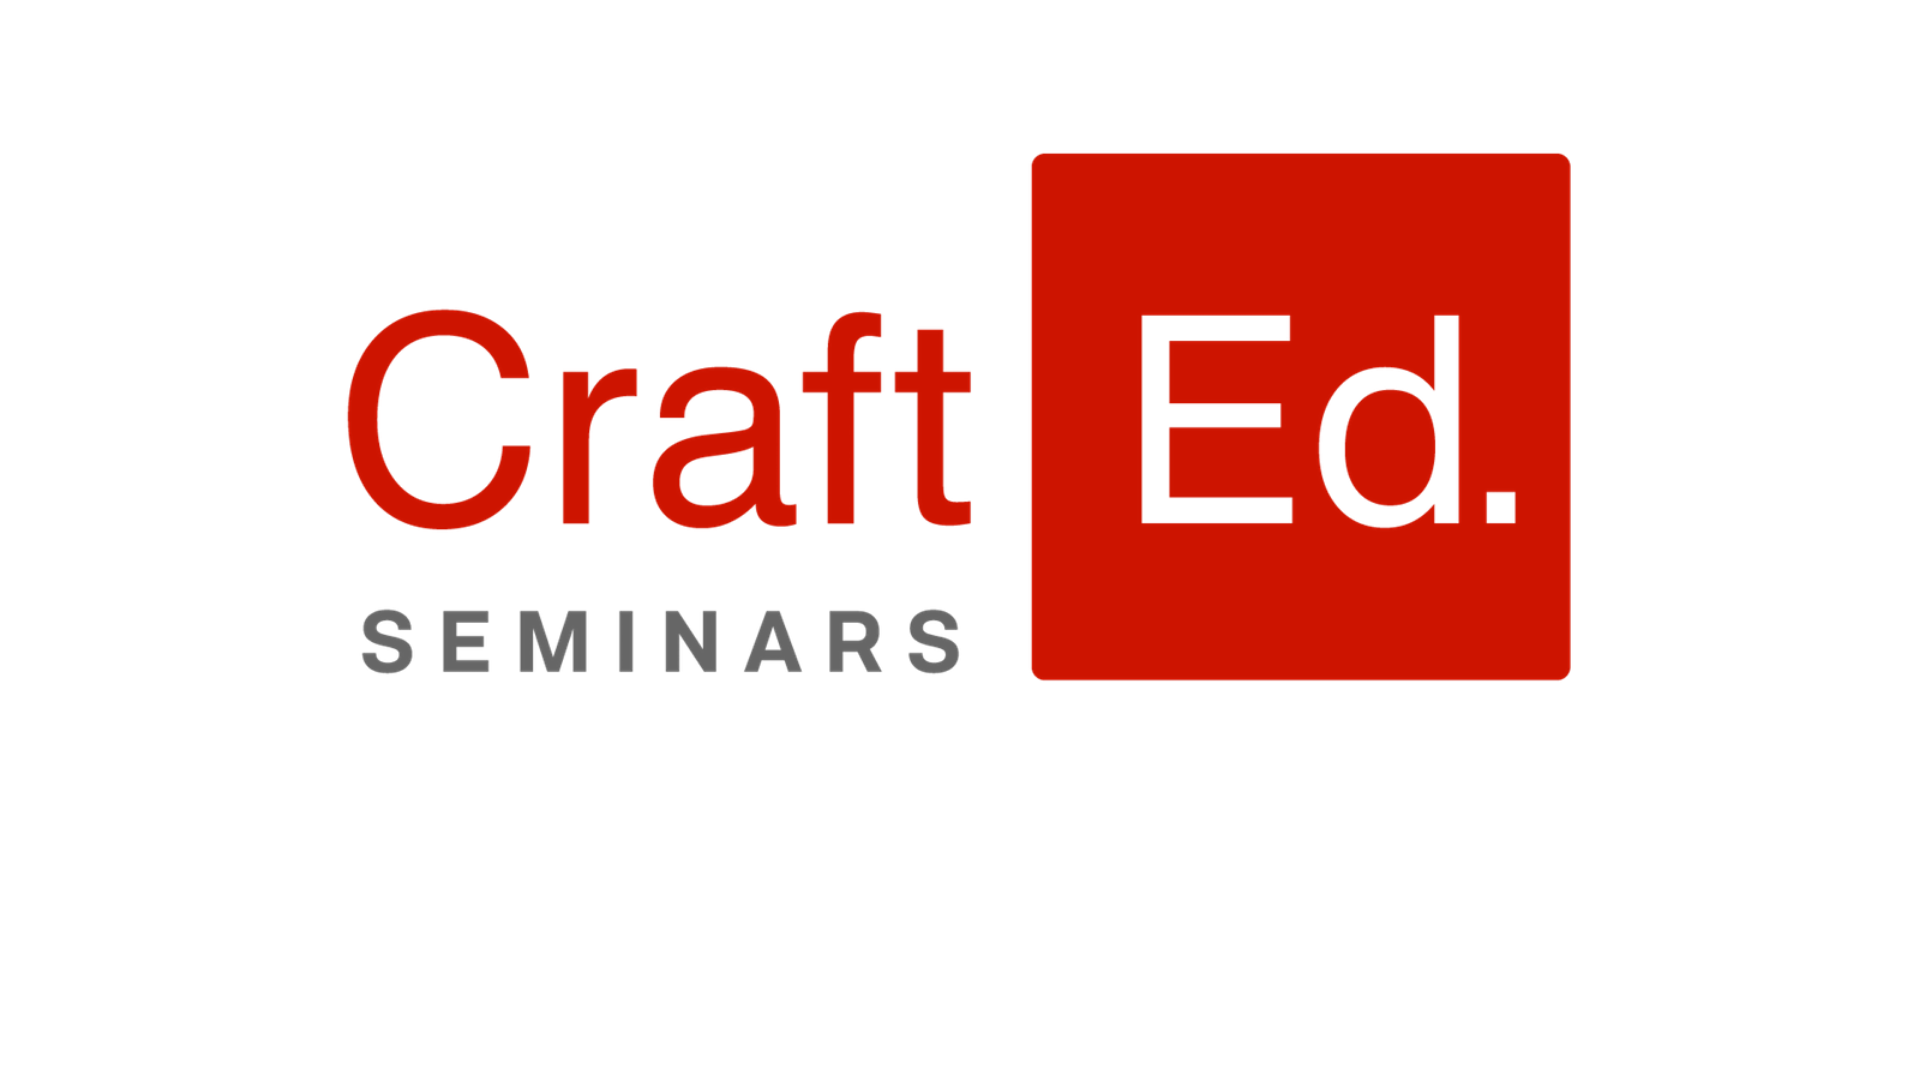 CraftEd. Seminars